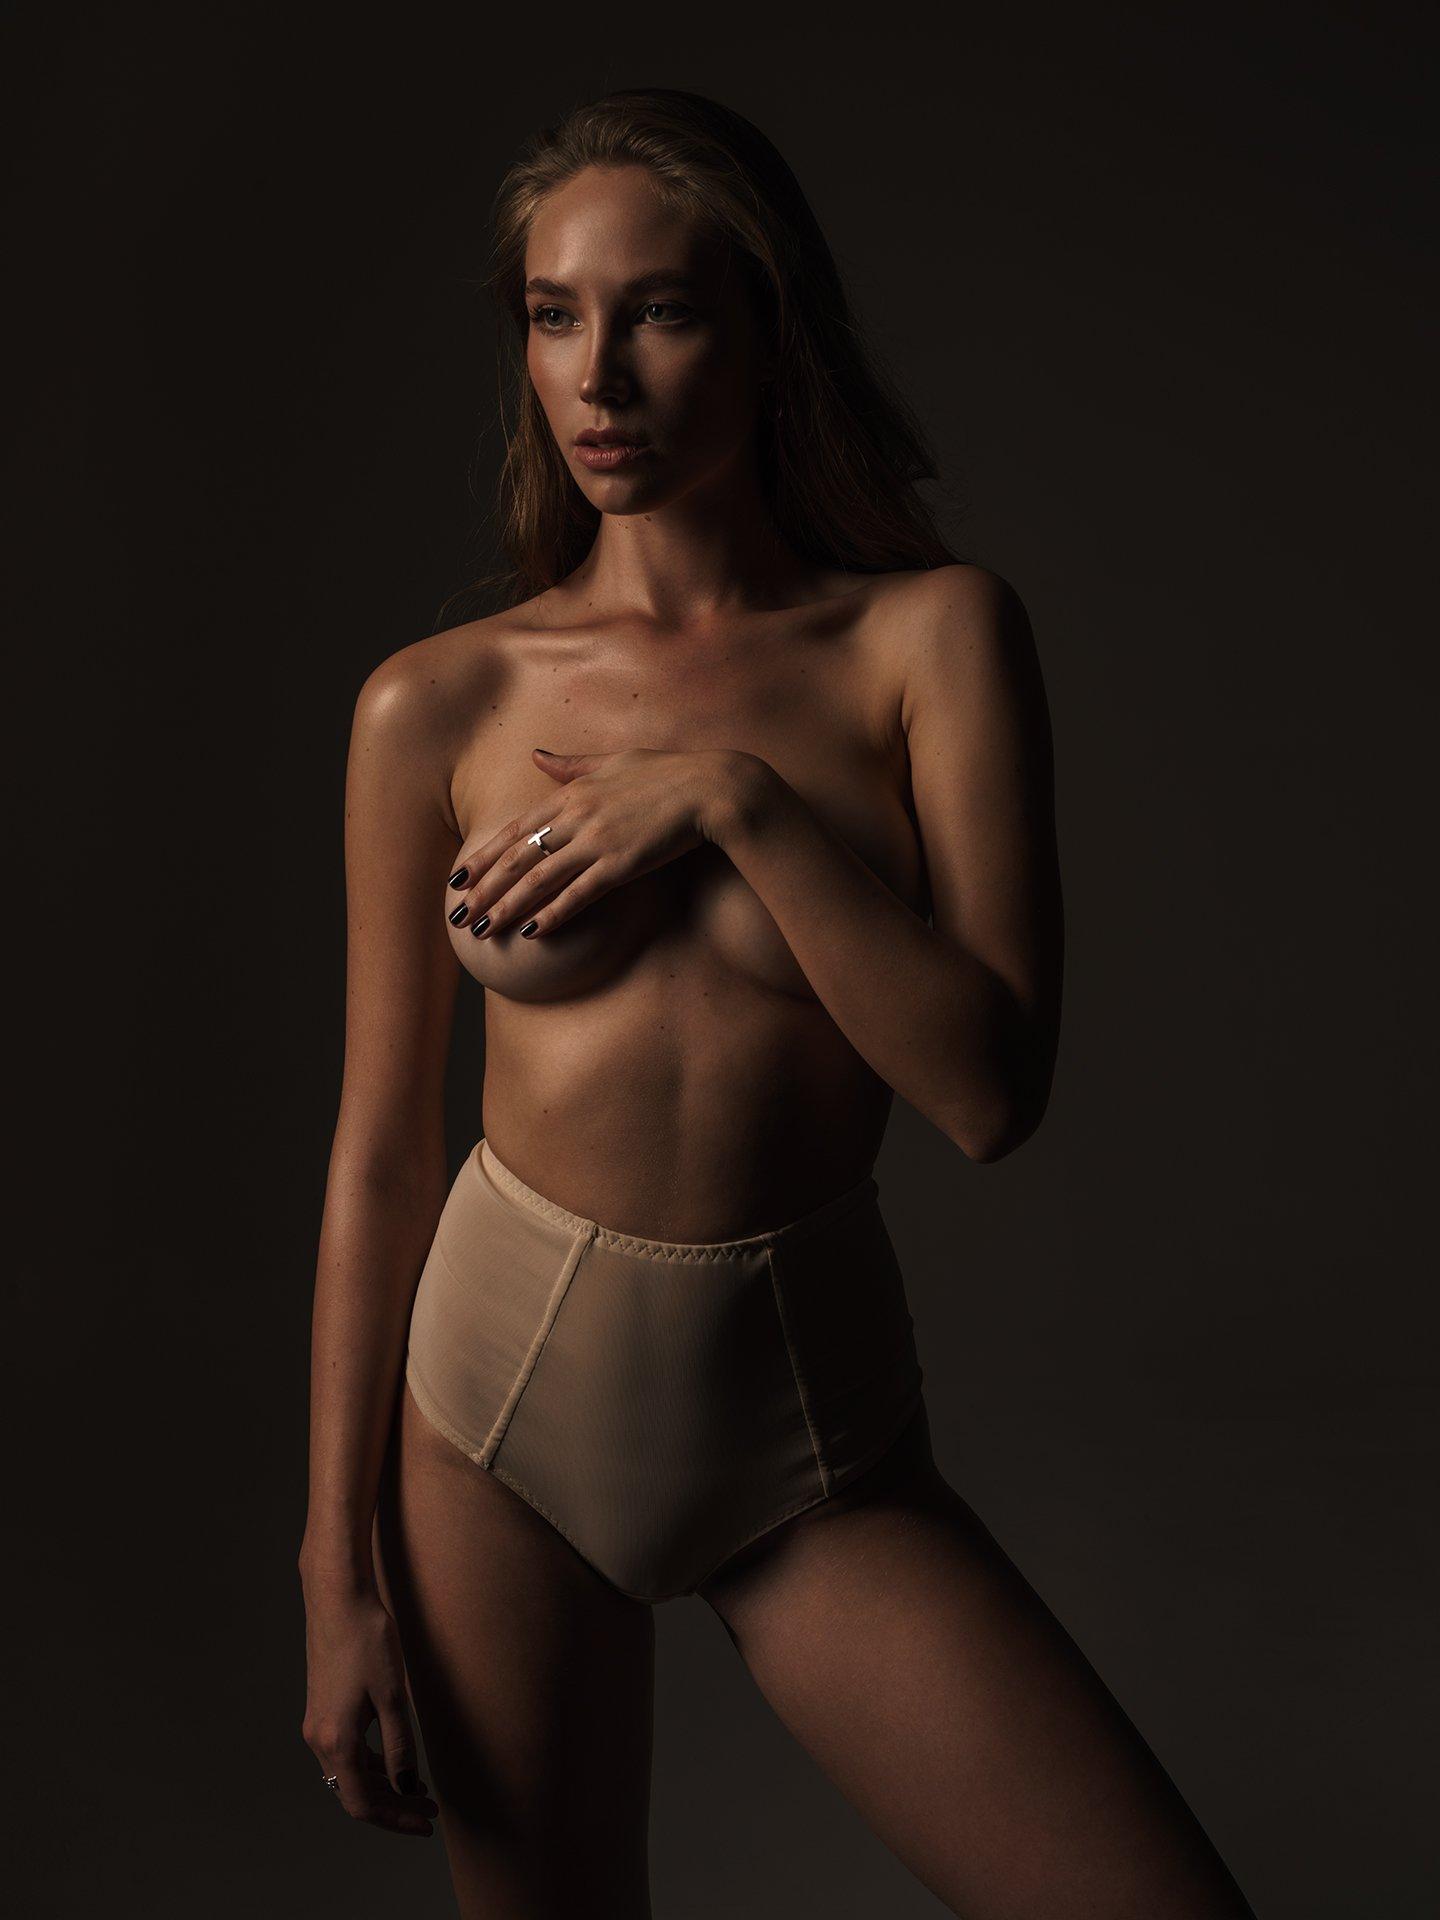 girl, studio, light, profoto, nude, underwear, worm, color, colour, shape, sexy, , Роман Филиппов